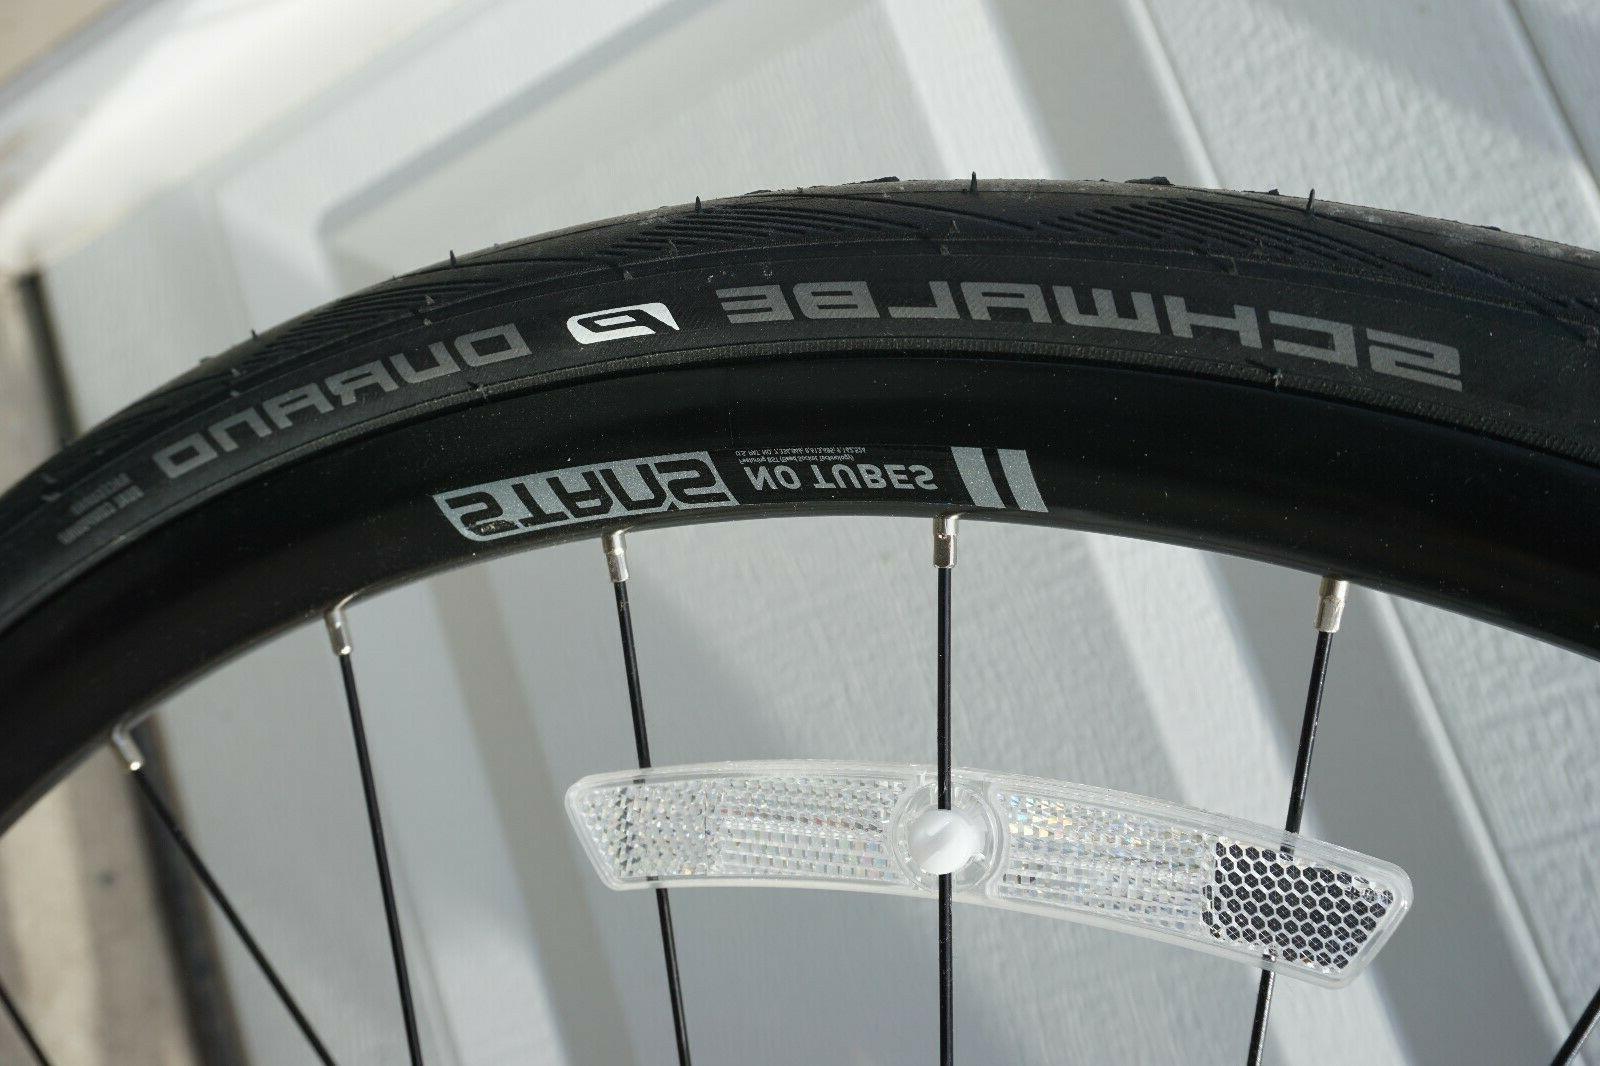 Access Bynum Carbon Fiber Disc Road Bike Shimano 105/Ultegra Hydraulic